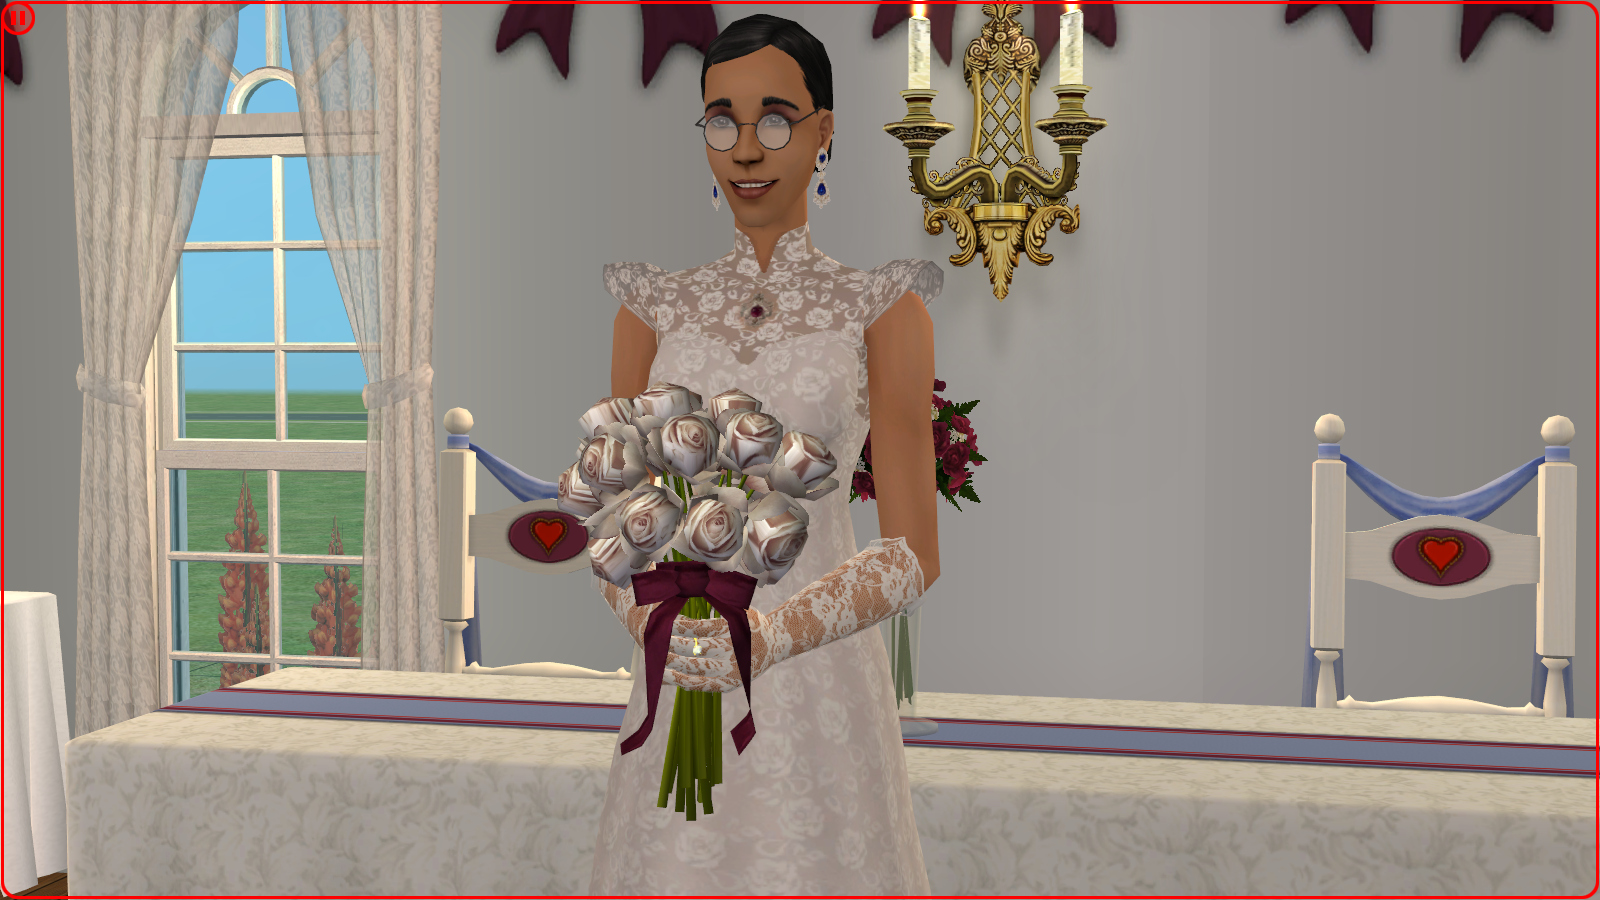 Mod The Sims   Vintage Lace and Rubies Cornelia's Wedding Dress